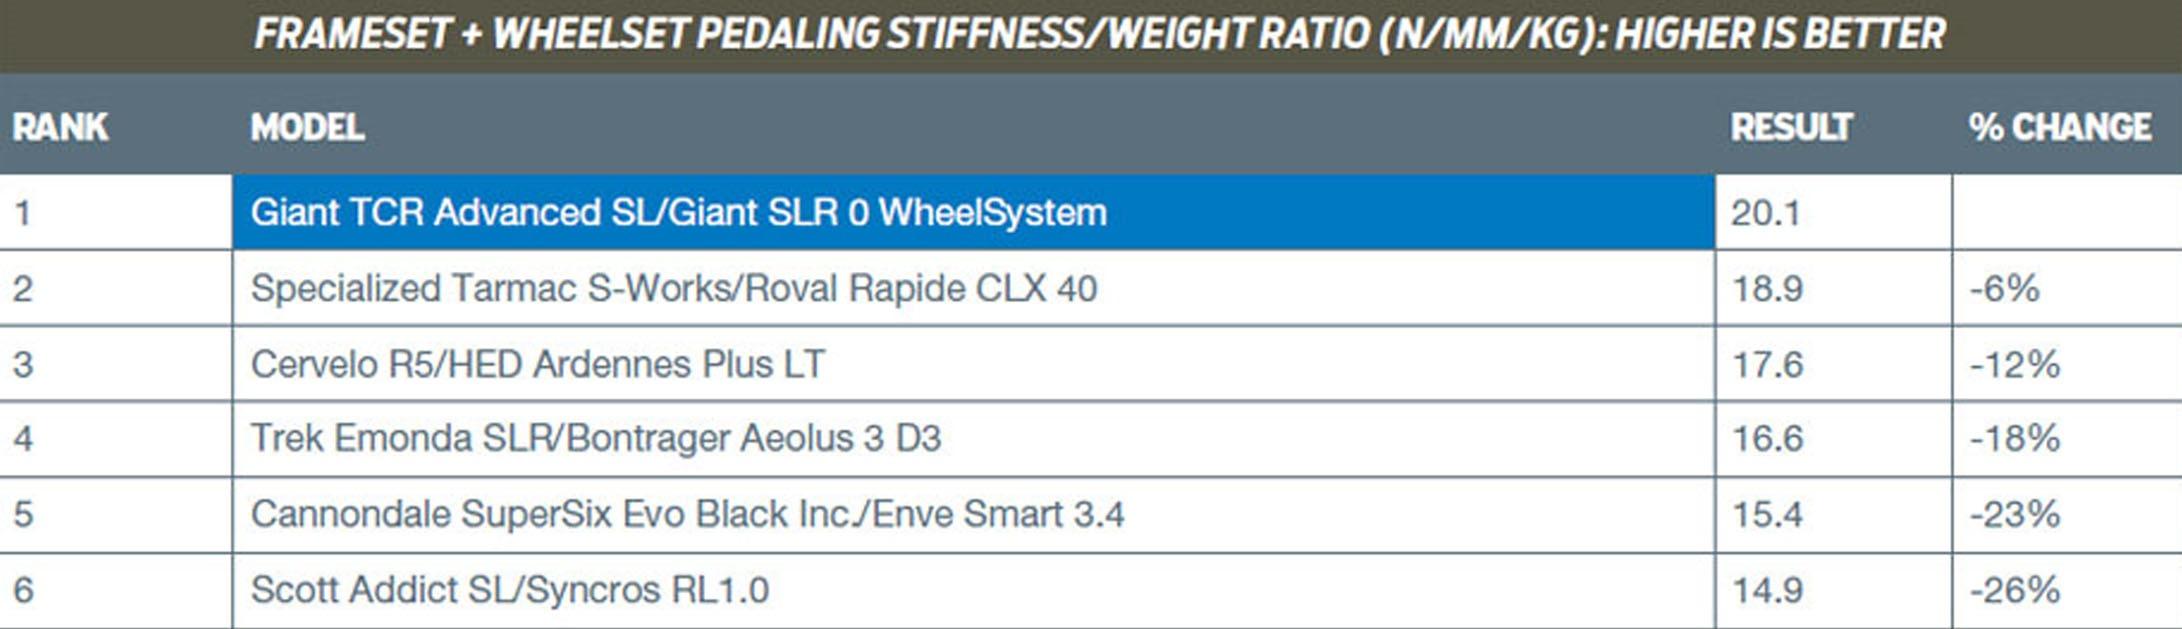 Frameset & Wheelset Pedalling Stiffness Test